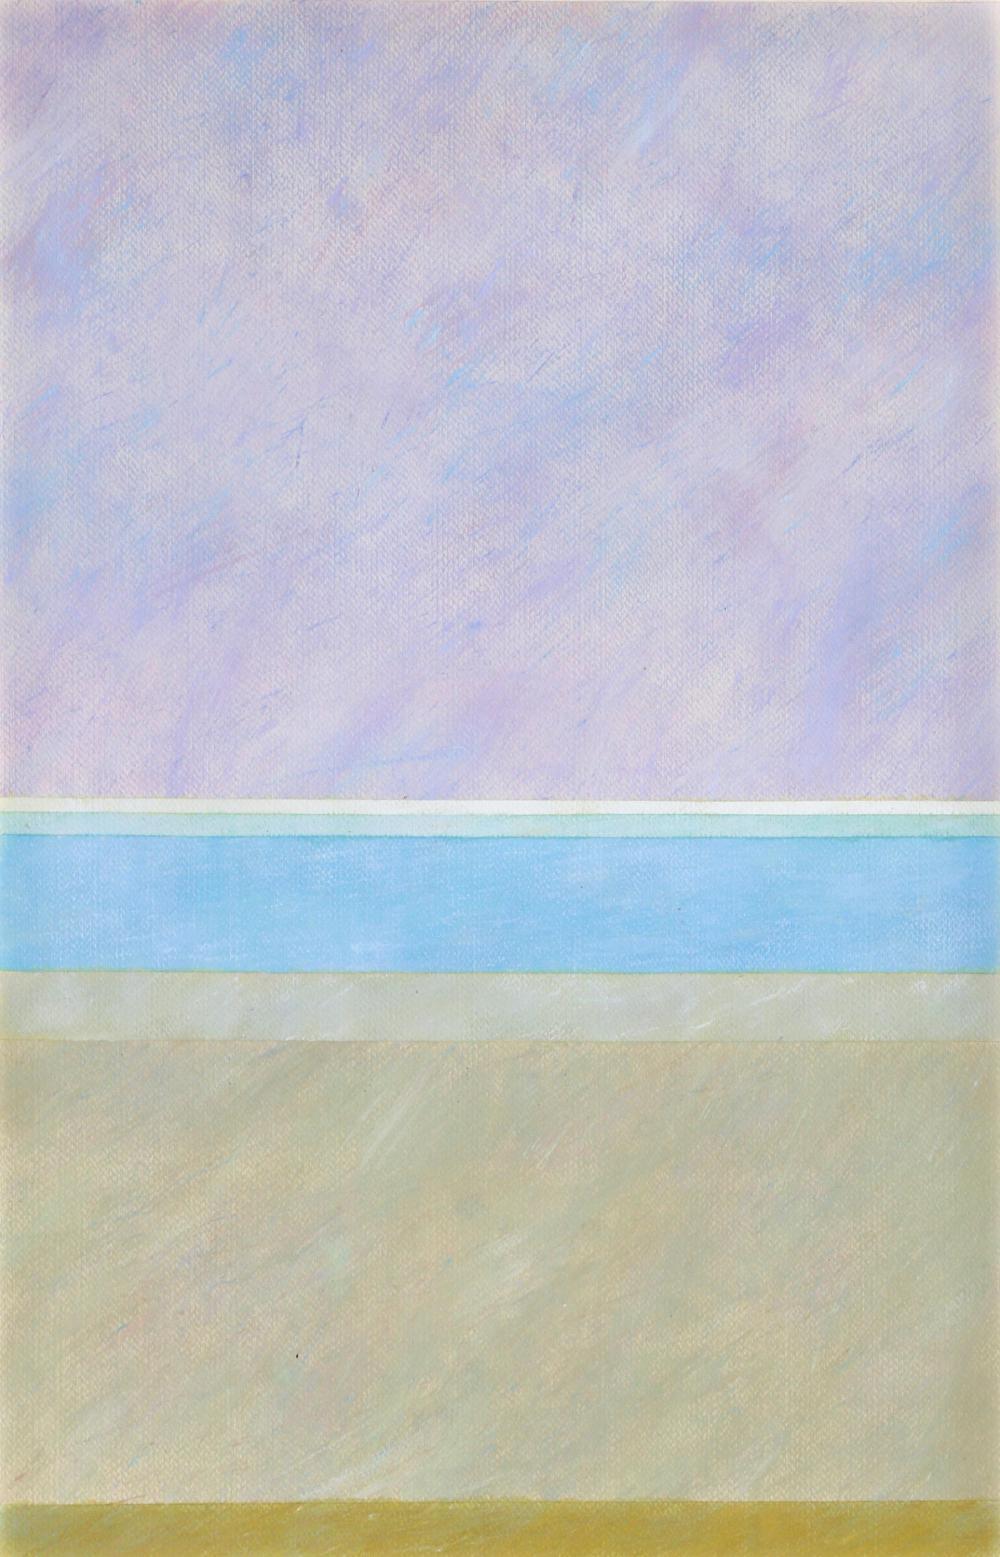 Jay Rosenblum, Untitled XVI, Abstract Stripes Lithograph